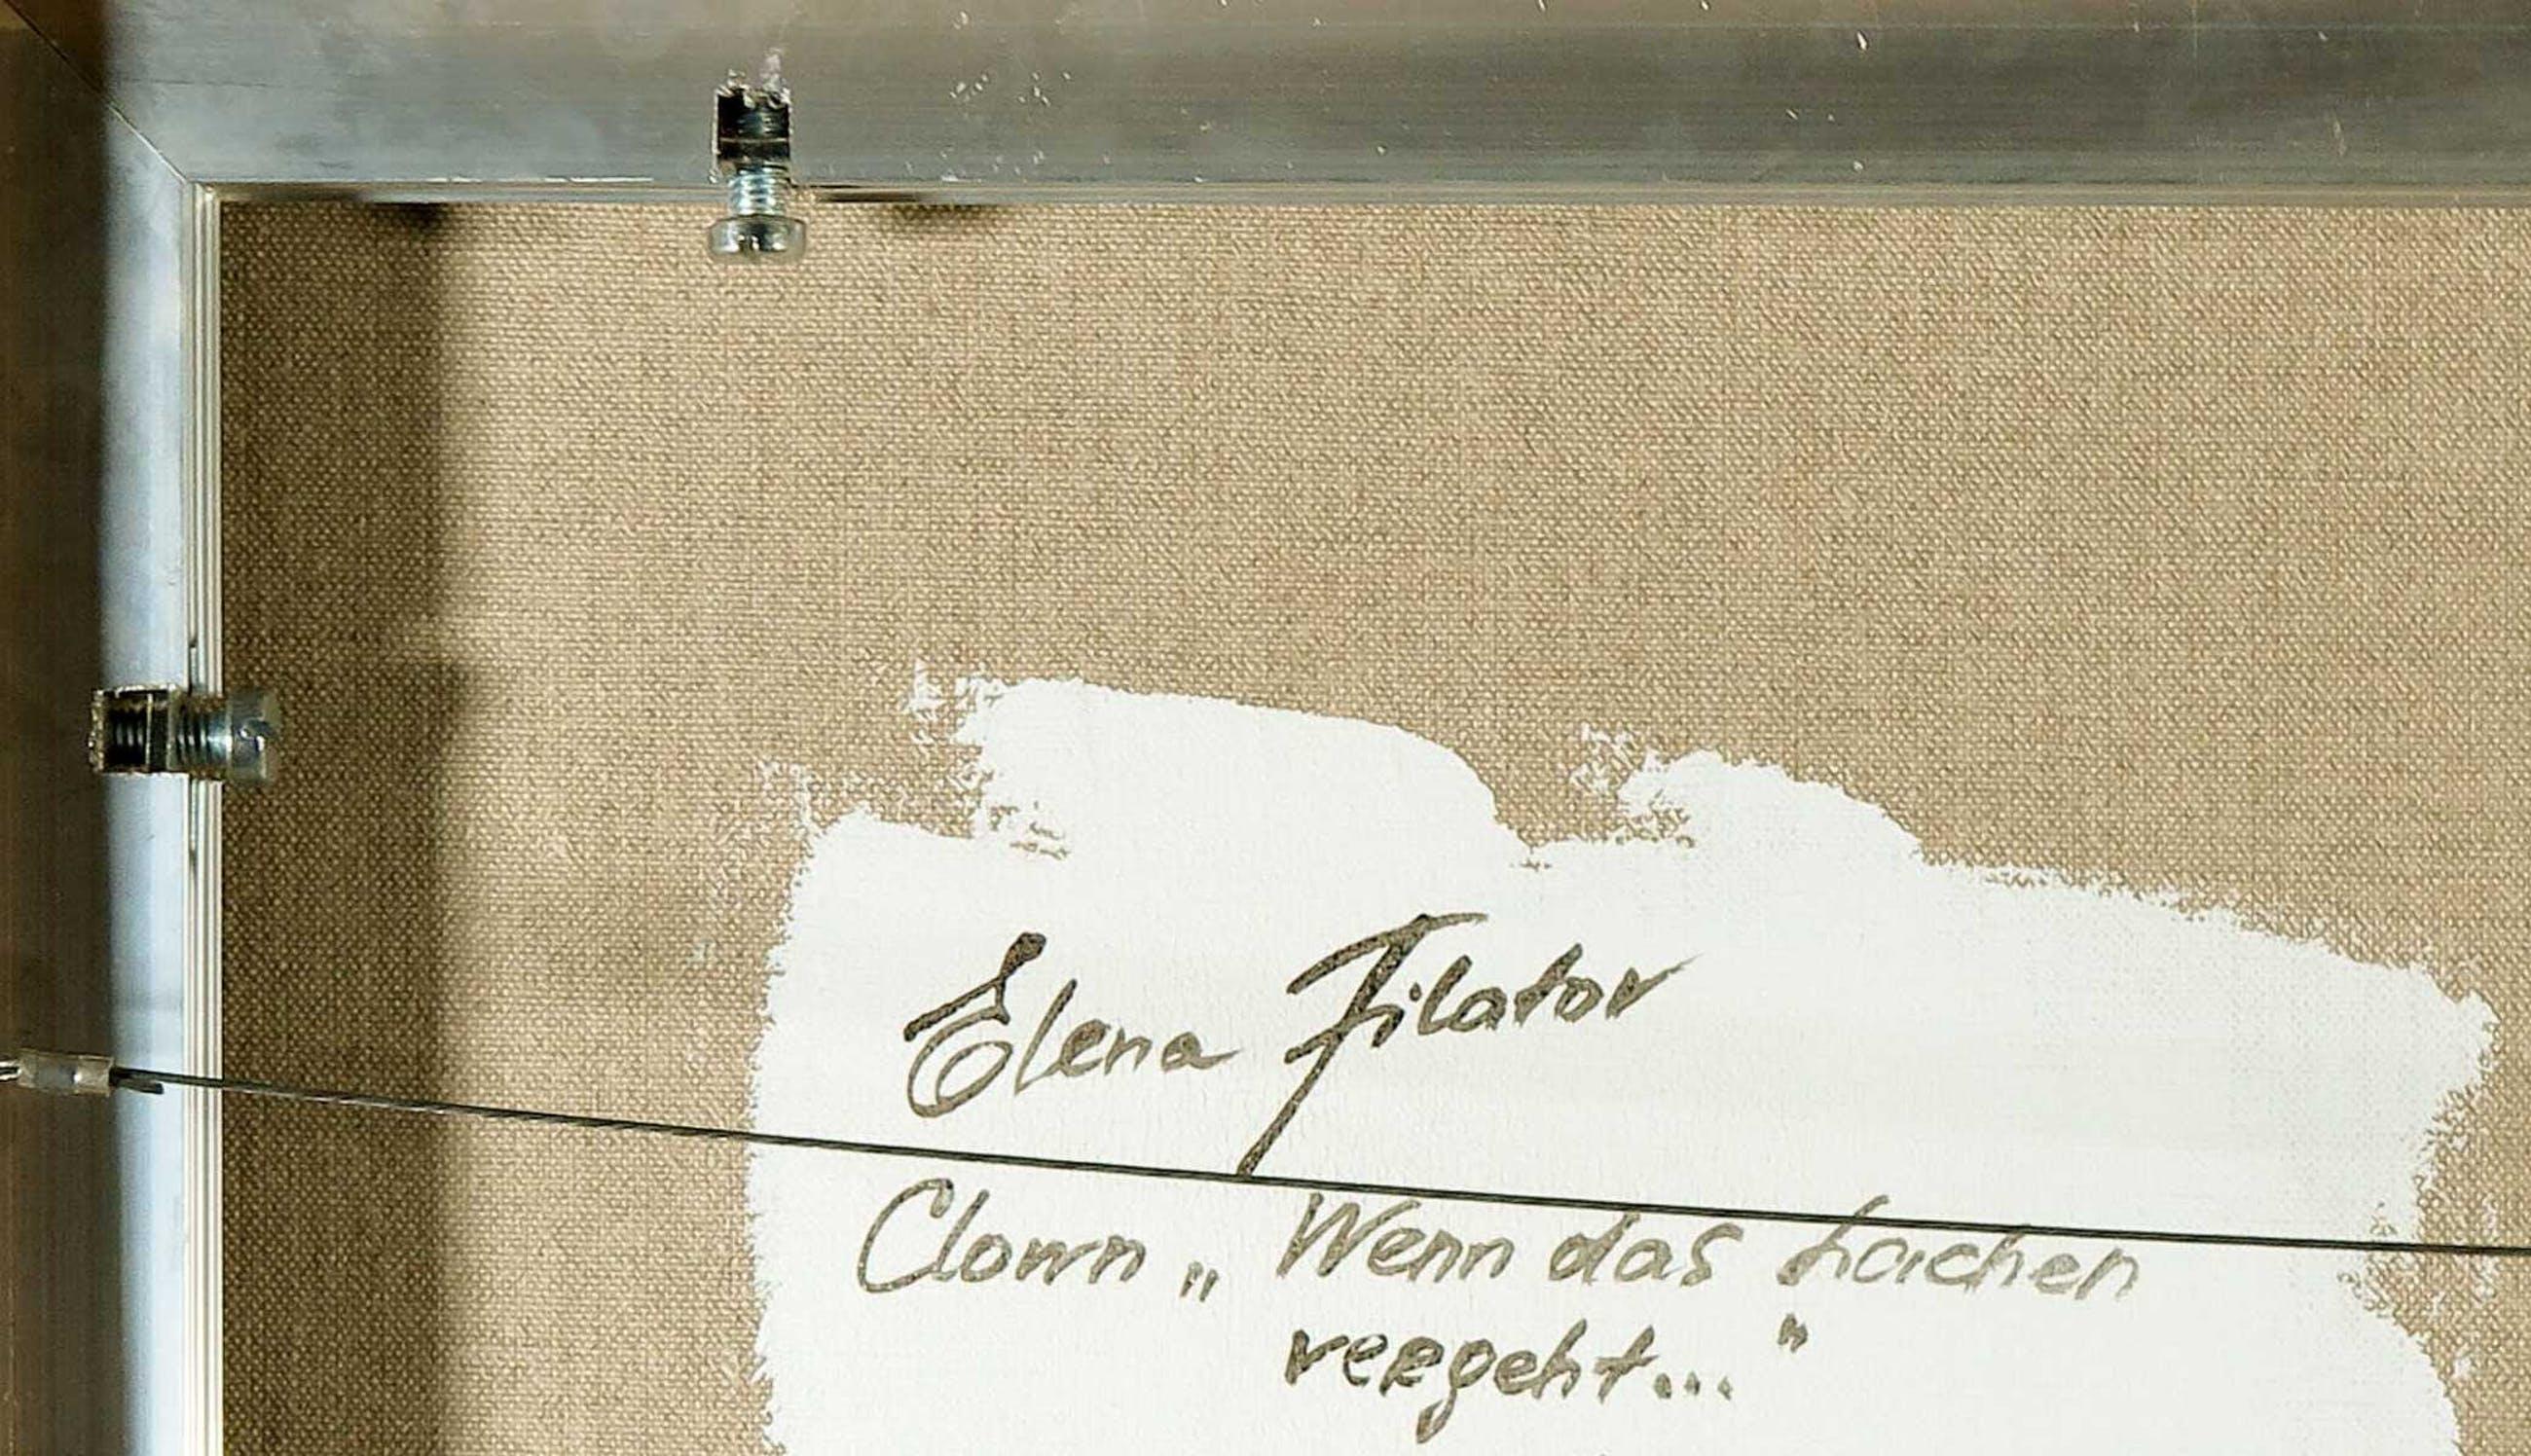 "Elena Filatov - Polygrafiek op doek, Clown ""Wenn das lachen vergeht"" (Groot) kopen? Bied vanaf 1!"